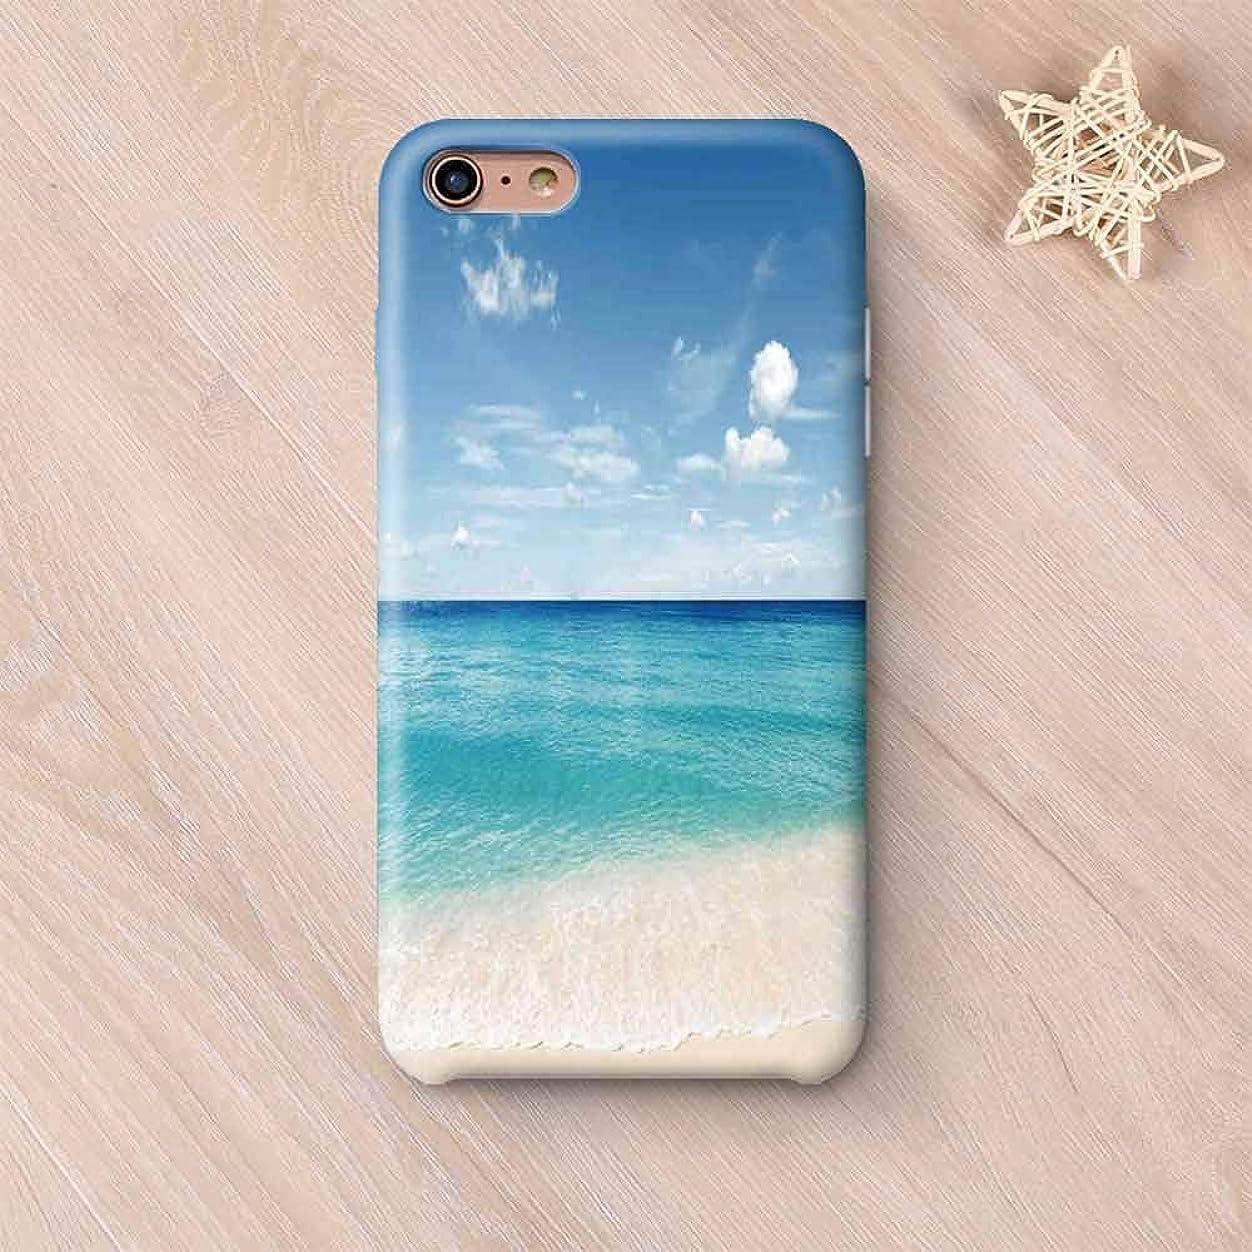 Ocean Decor Custom Compatible with iPhone Case,Tropical Carribean Sea Shore Sand Beach Blue Calm Peaceful Sea Decorative Compatible with iPhone 6/6s,iPhone 6 Plus / 6s Plus oilw198995793